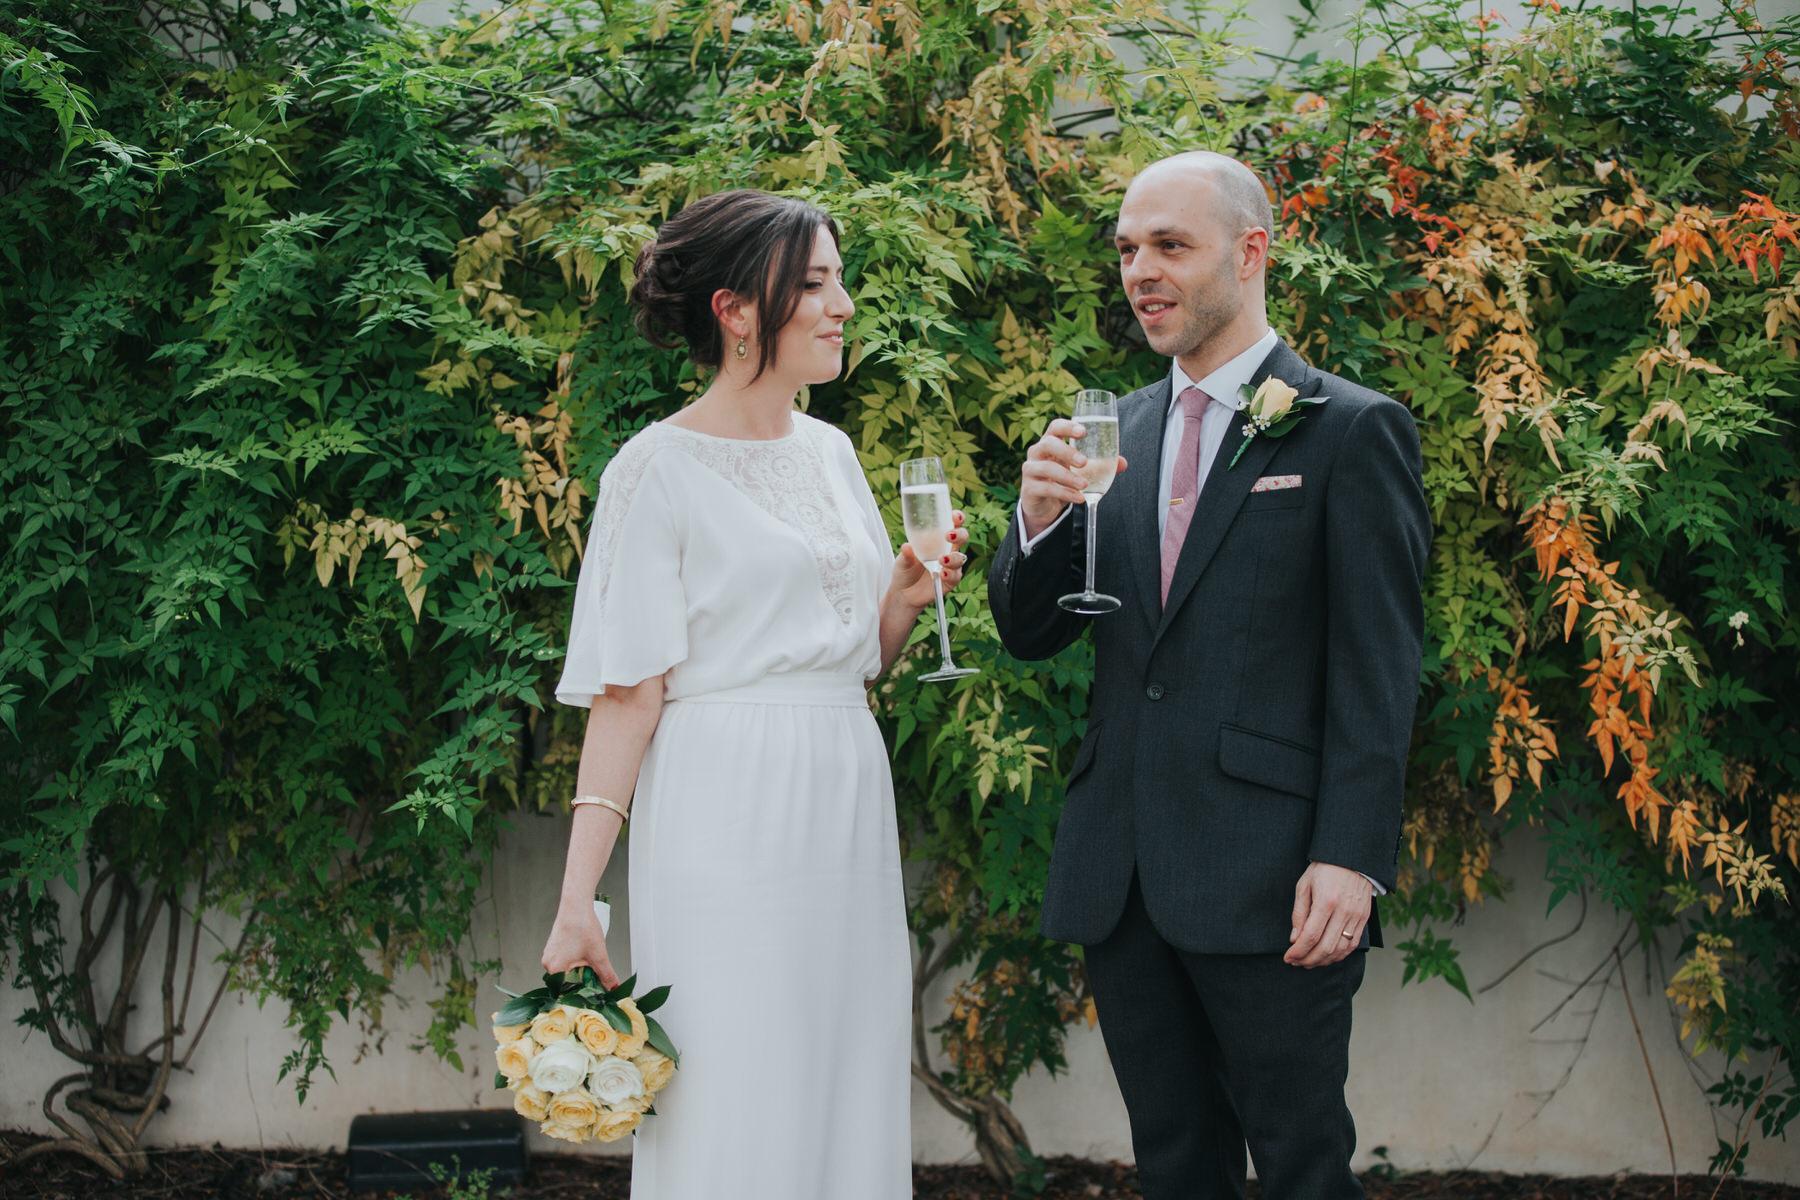 206 sneaky glass bubbly bride groom wedding reportage fern ivy wall.jpg